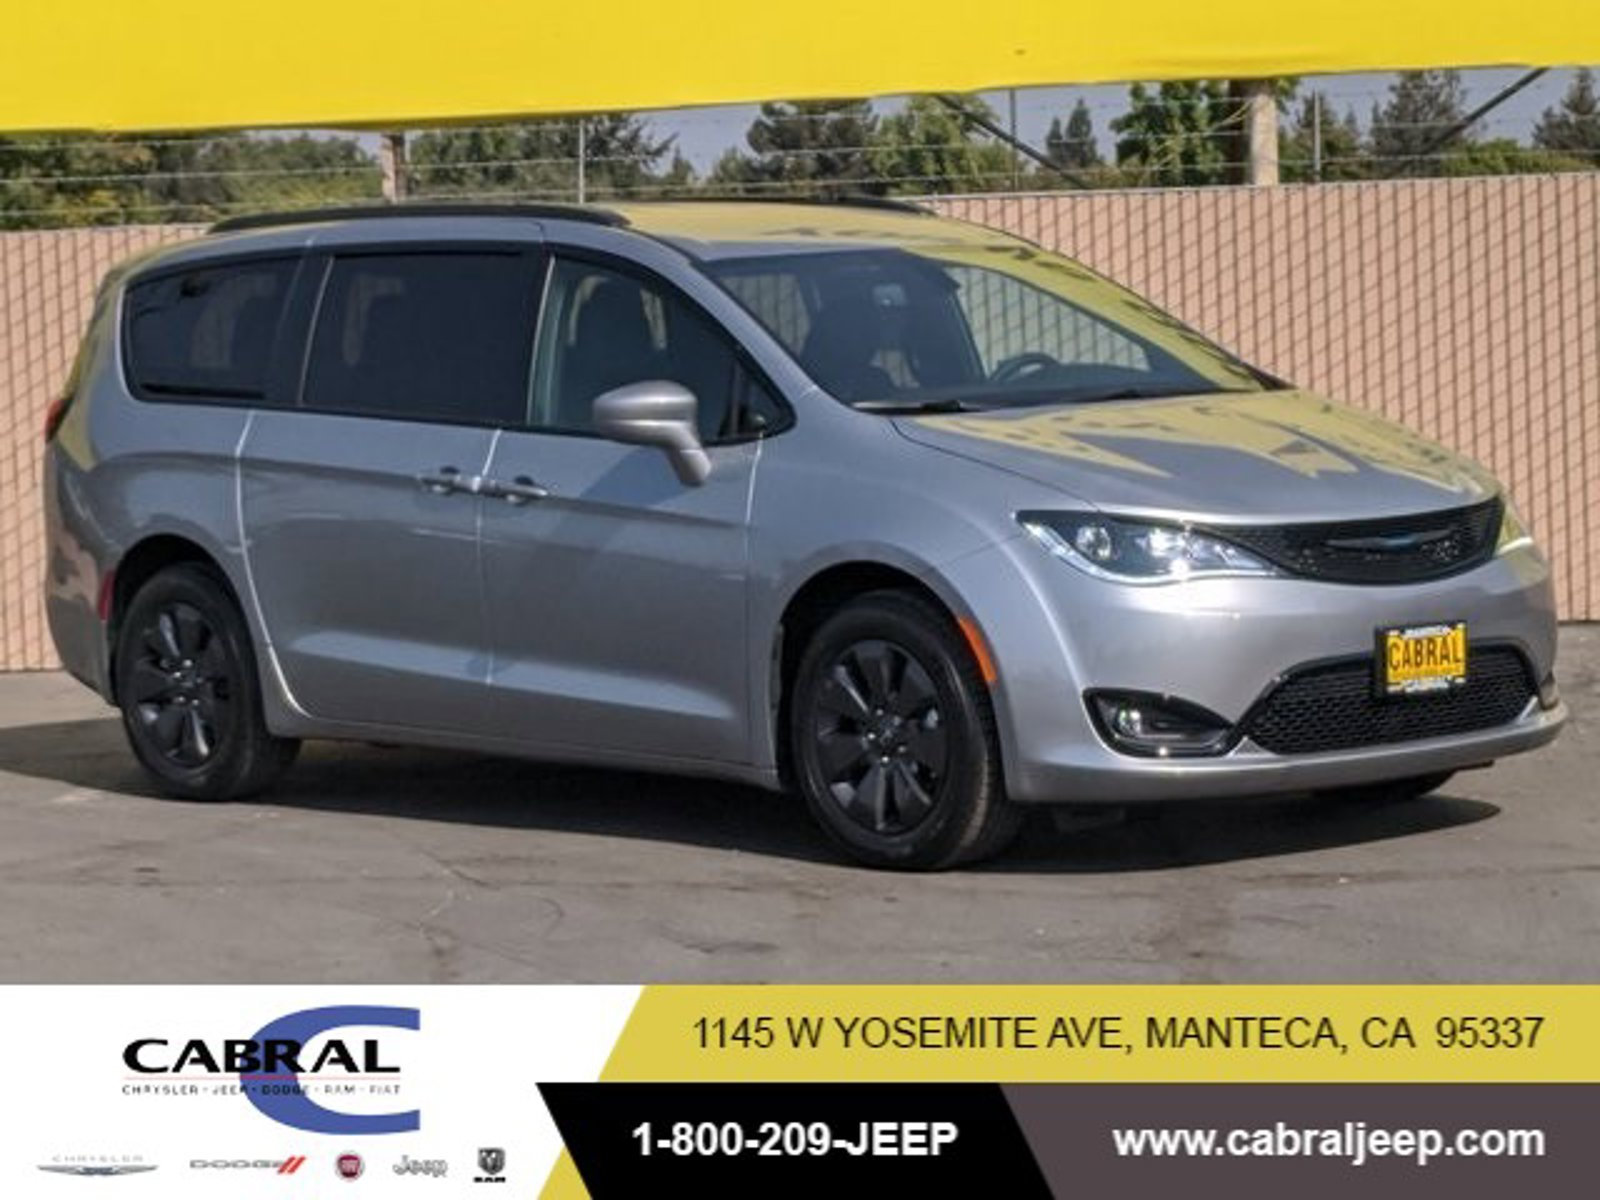 2020 Chrysler Pacifica Hybrid Touring L Hybrid Touring L FWD Gas/Electric V-6 3.6 L/220 [0]